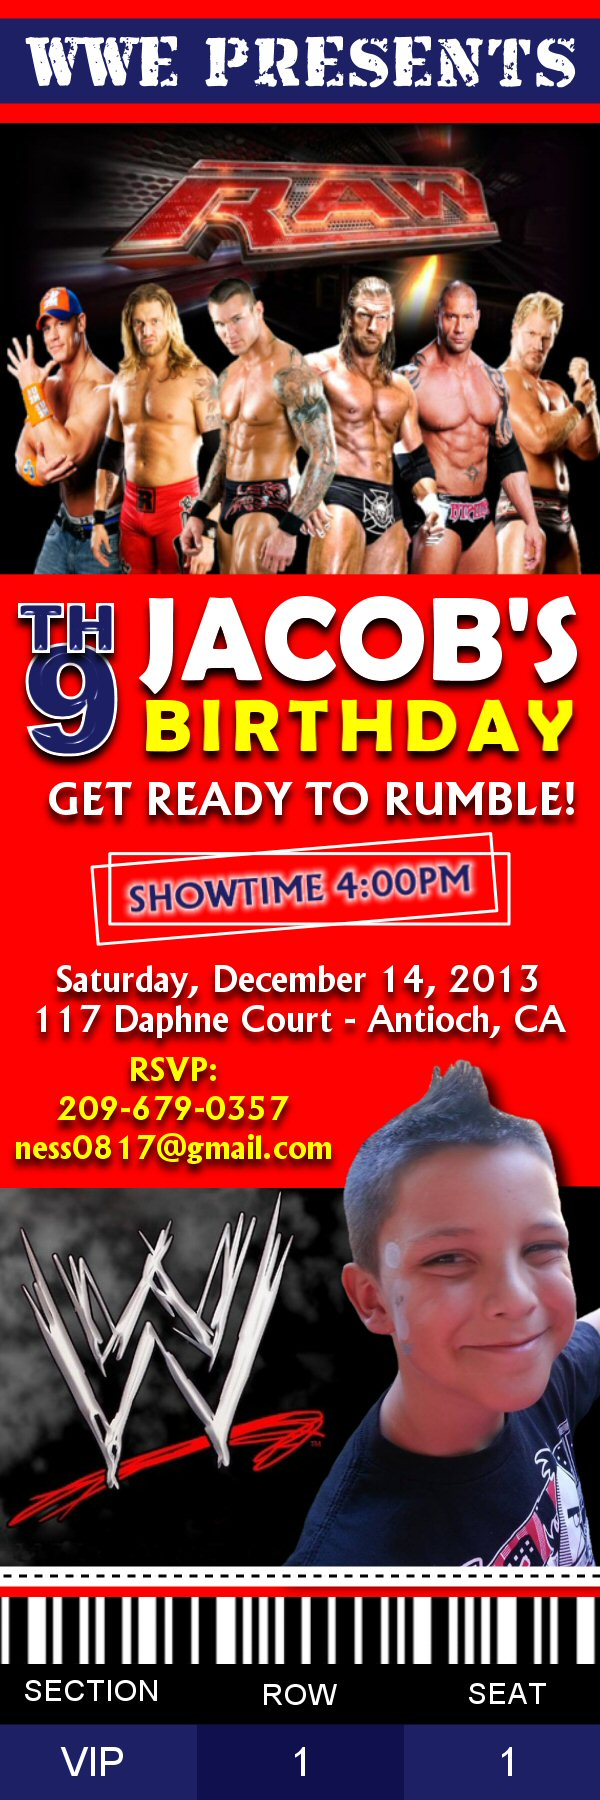 Ticket invitation 2x6 size facebookuprintinvitations kids party centerpieces ticket invitation 2x6 size facebookuprintinvitations invite filmwisefo